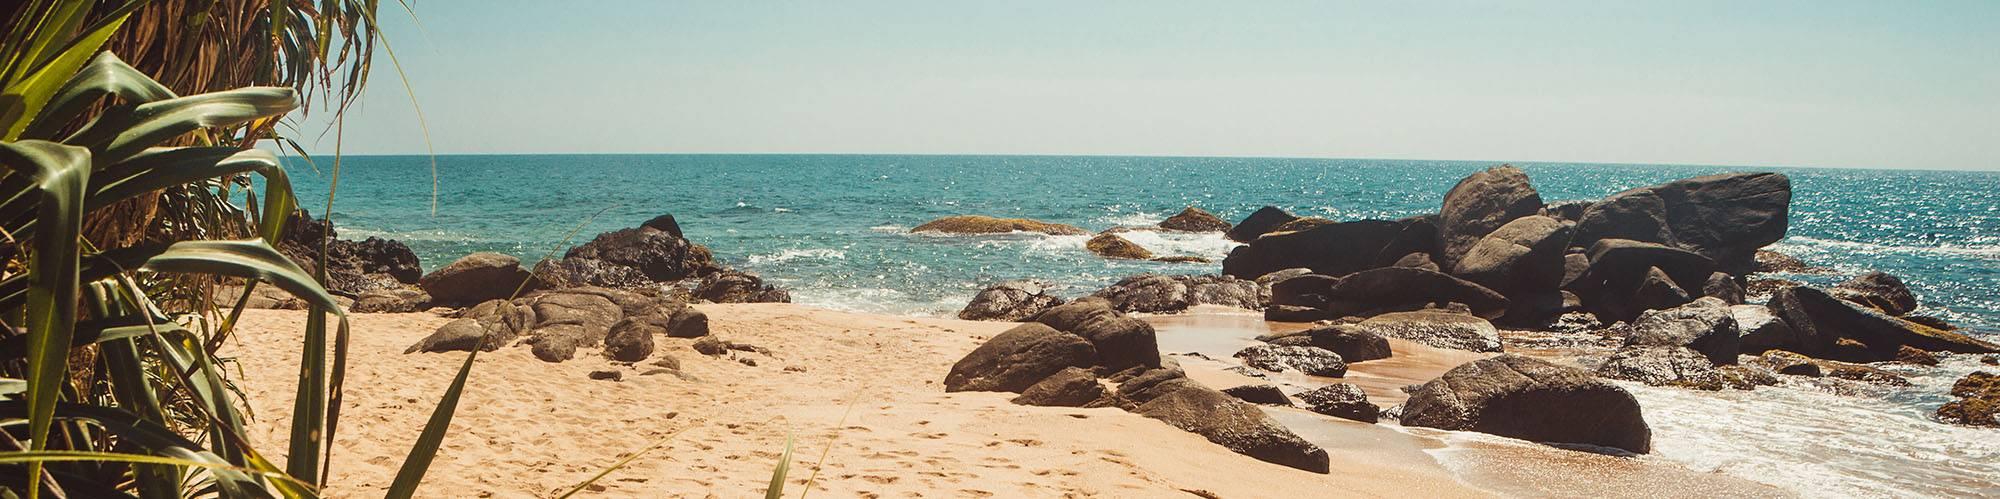 Sri Lanka bietet Erholung am Strand